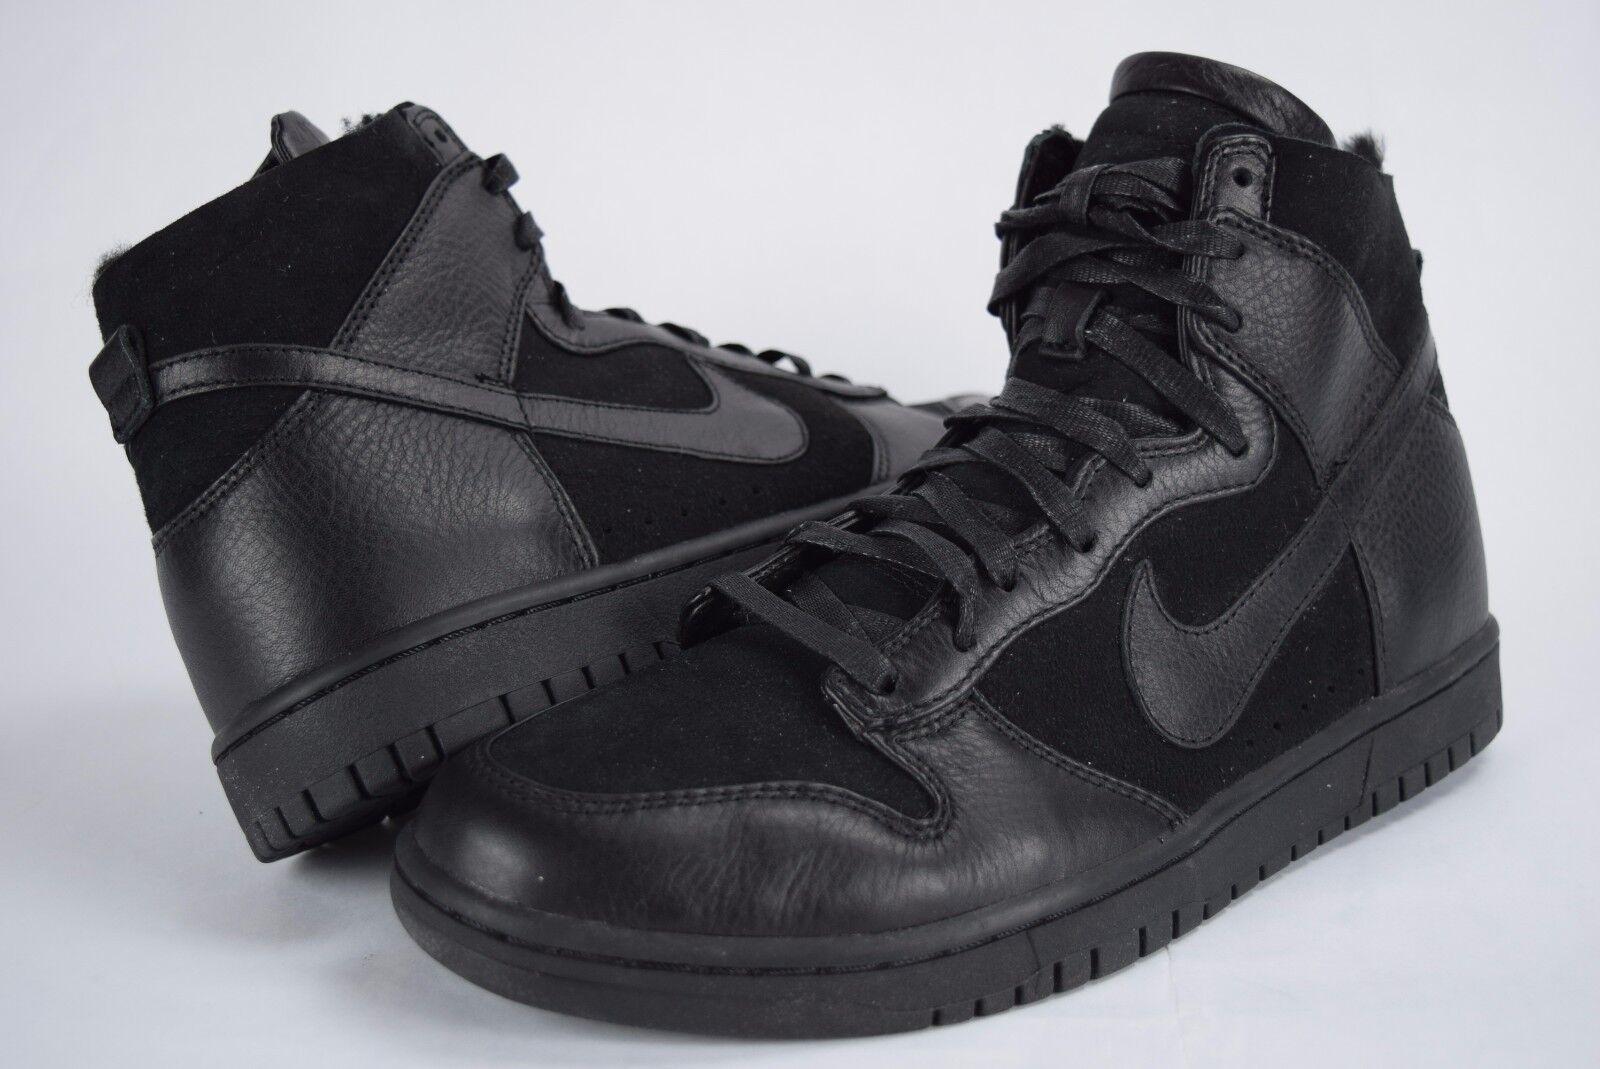 New 175 Mens Nike Dunk LUX SP Sherpa 744301 001 Nikelab Black FUR sz 10.5-11